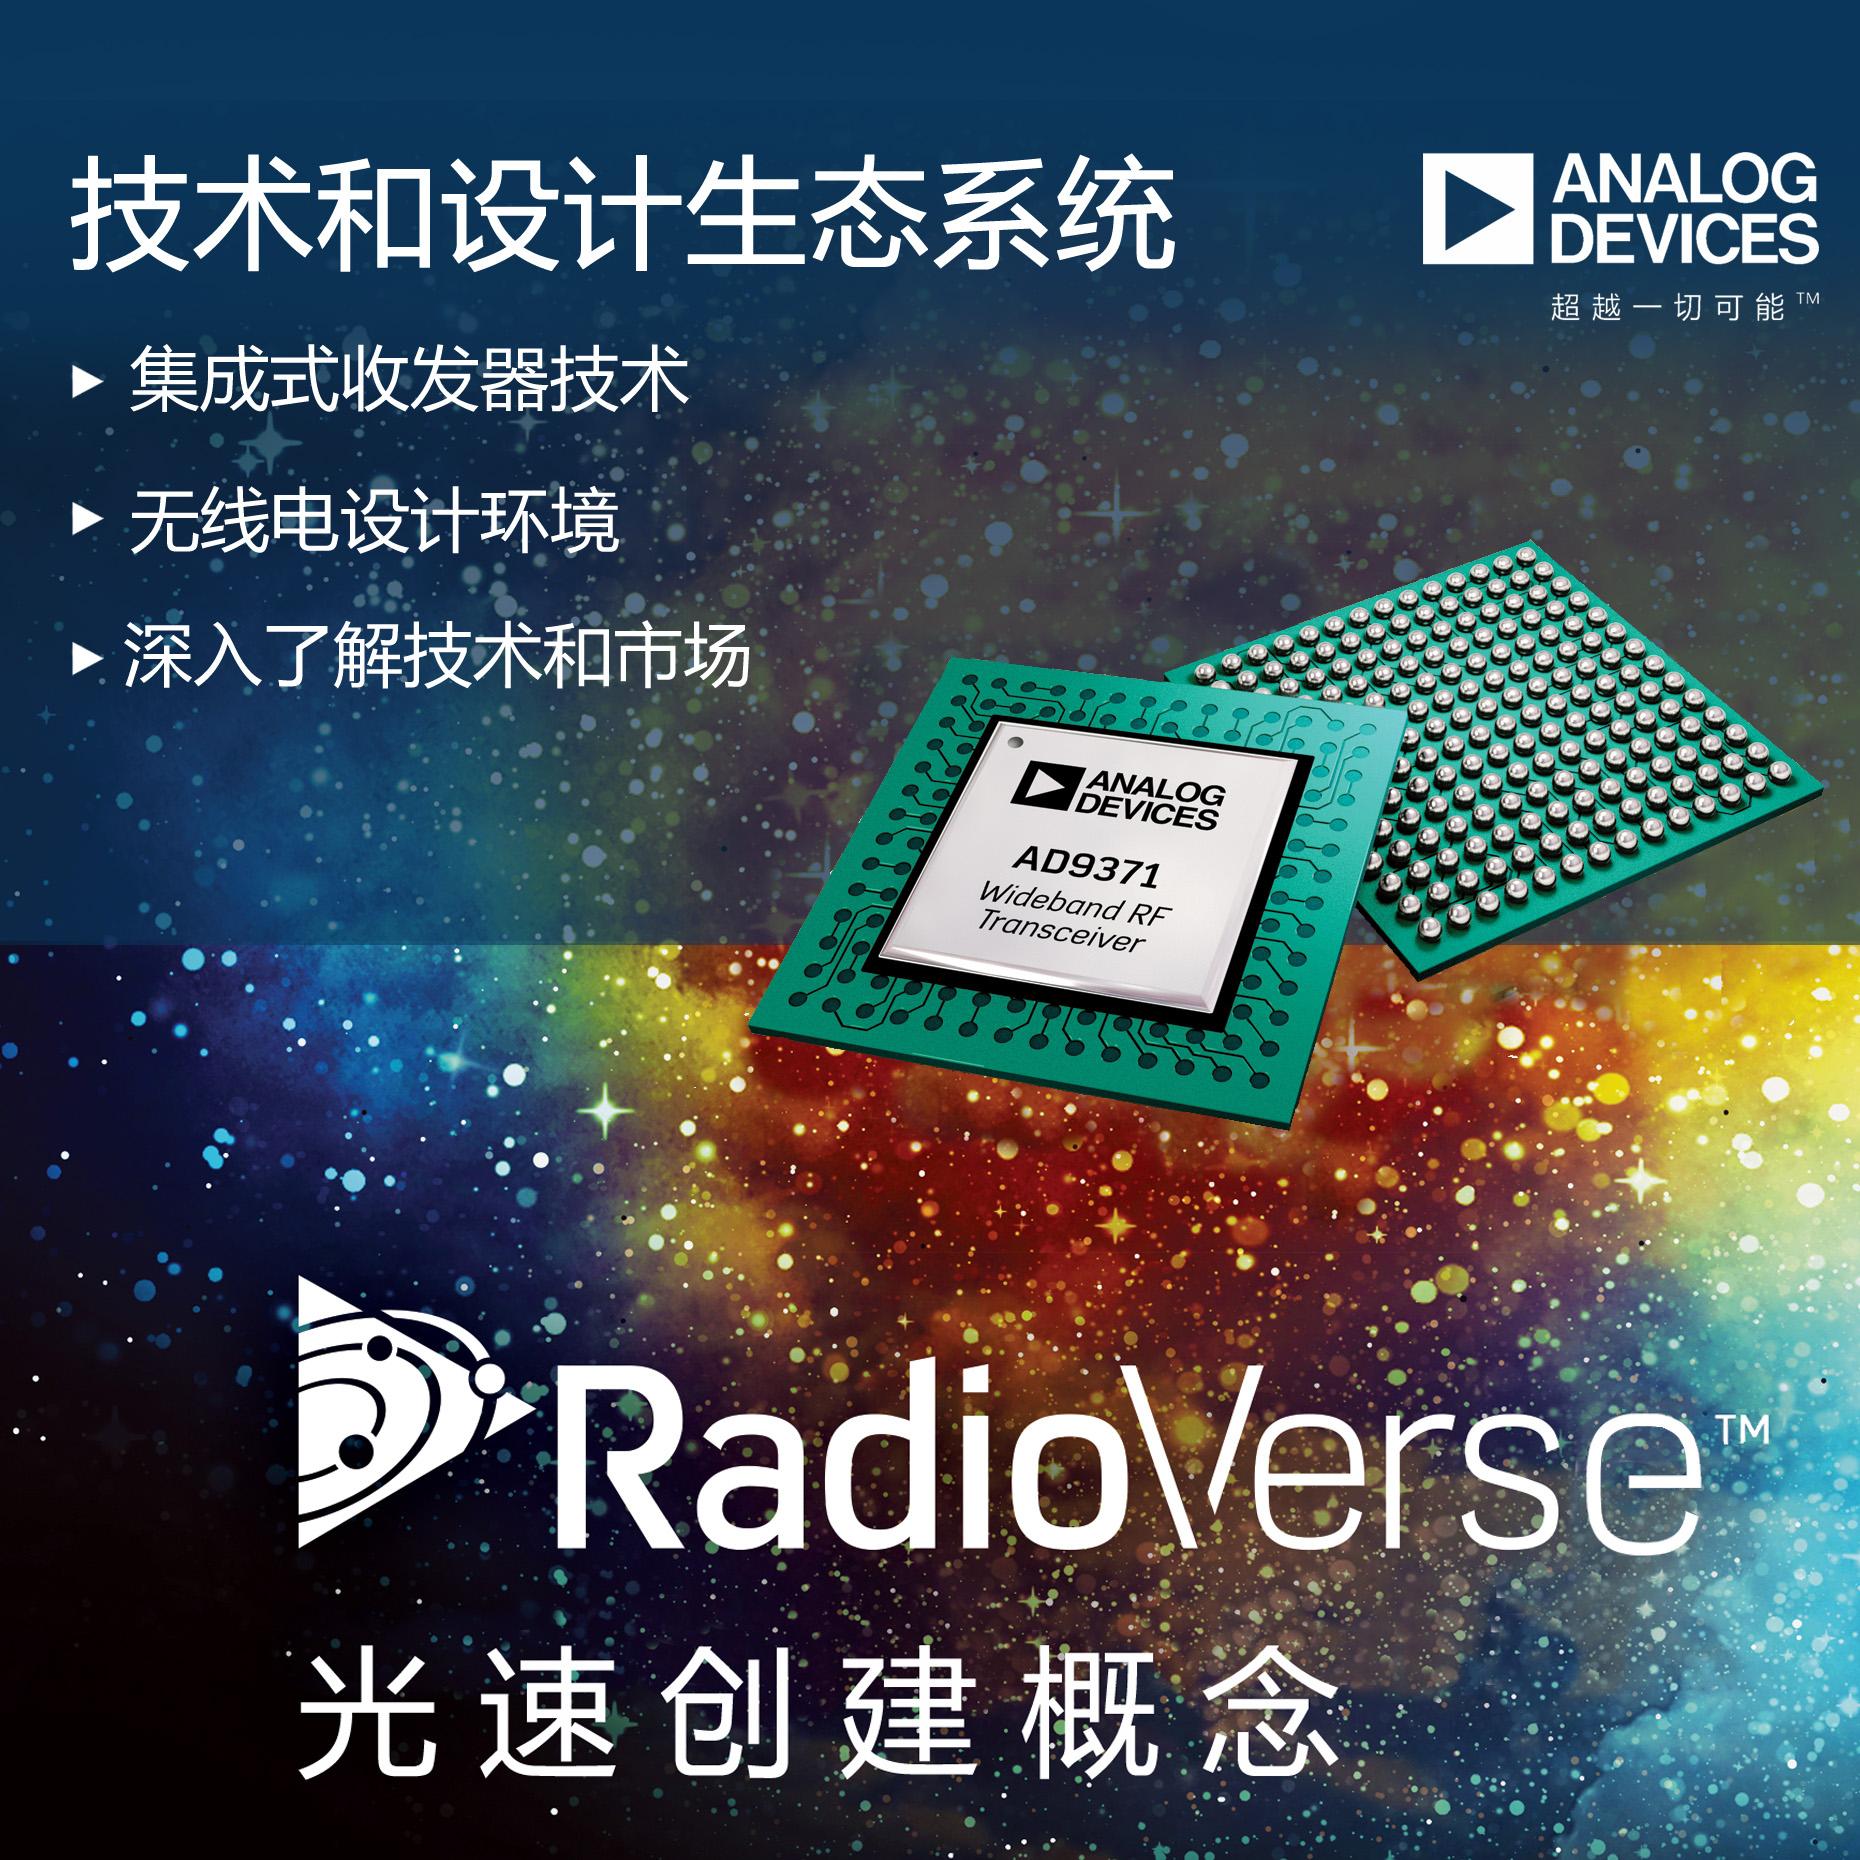 ADI公司利用RadioVerse™技术和设计生态系统简化无线系统设计